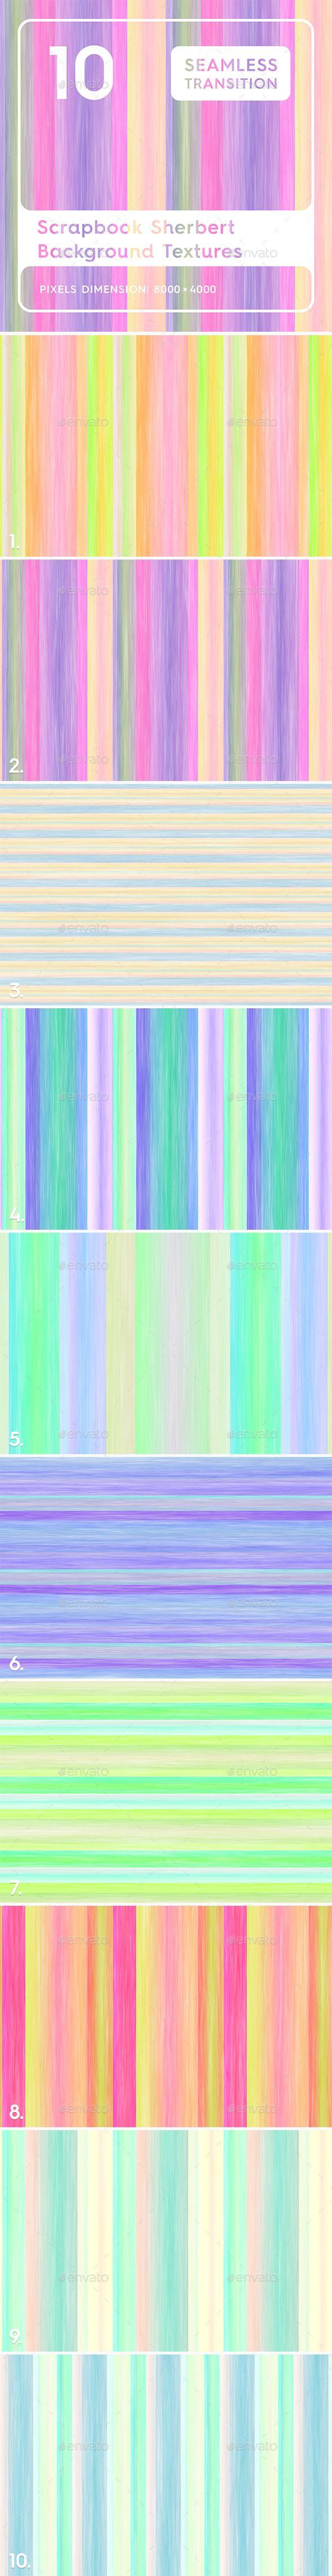 10 Scrapbook Sherbert Textures Professionally designed background 590x4581